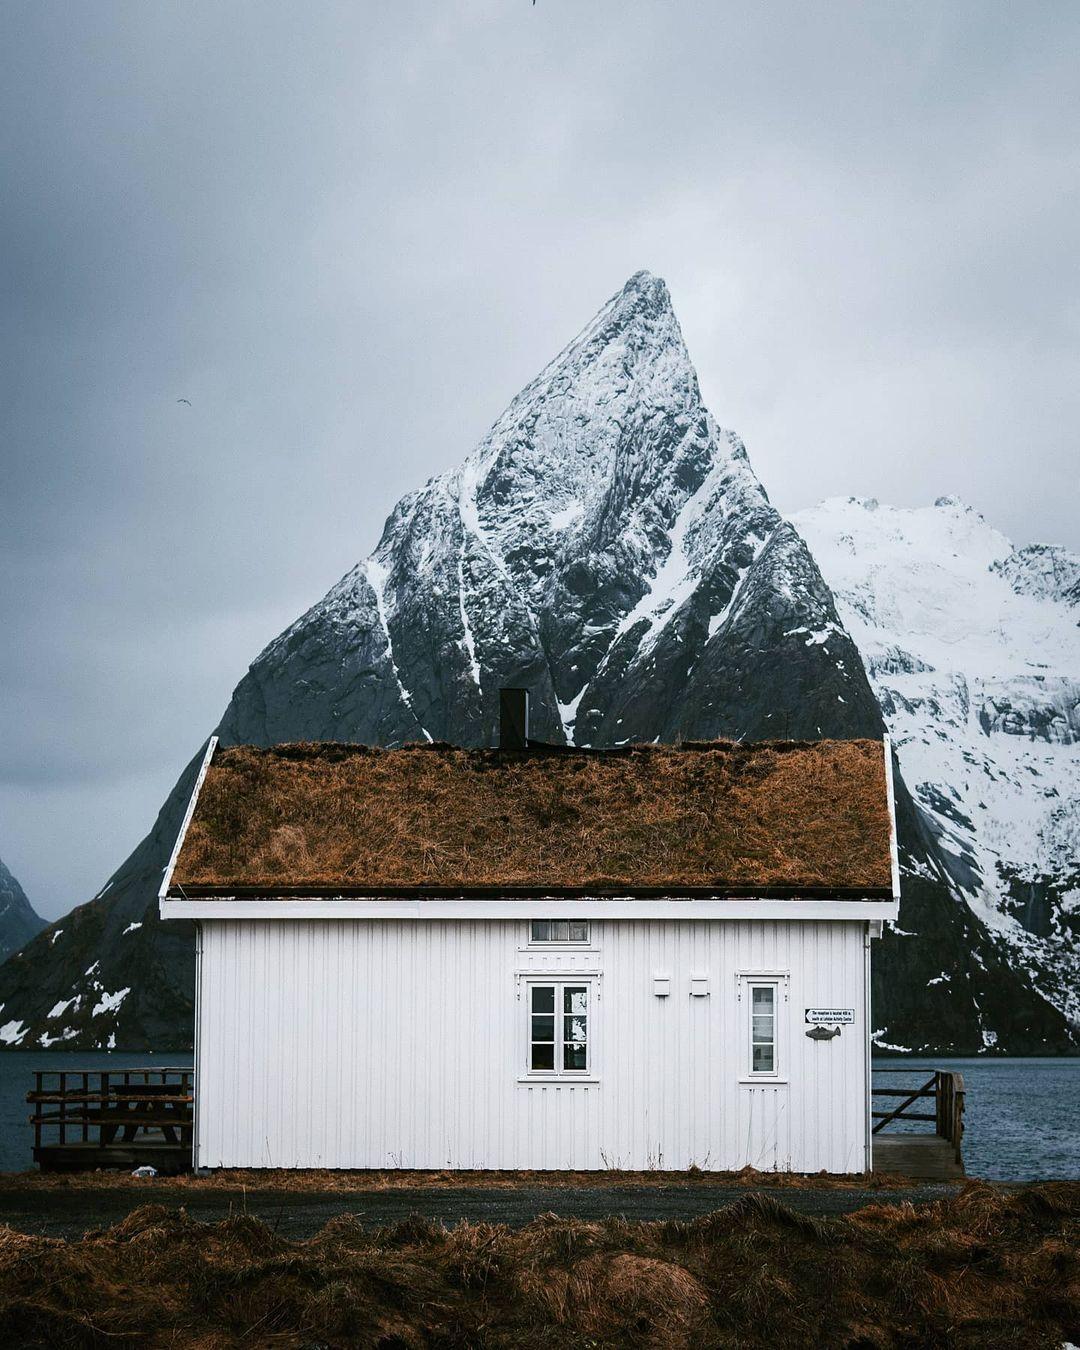 Природа и путешествия на снимках Андре Александра